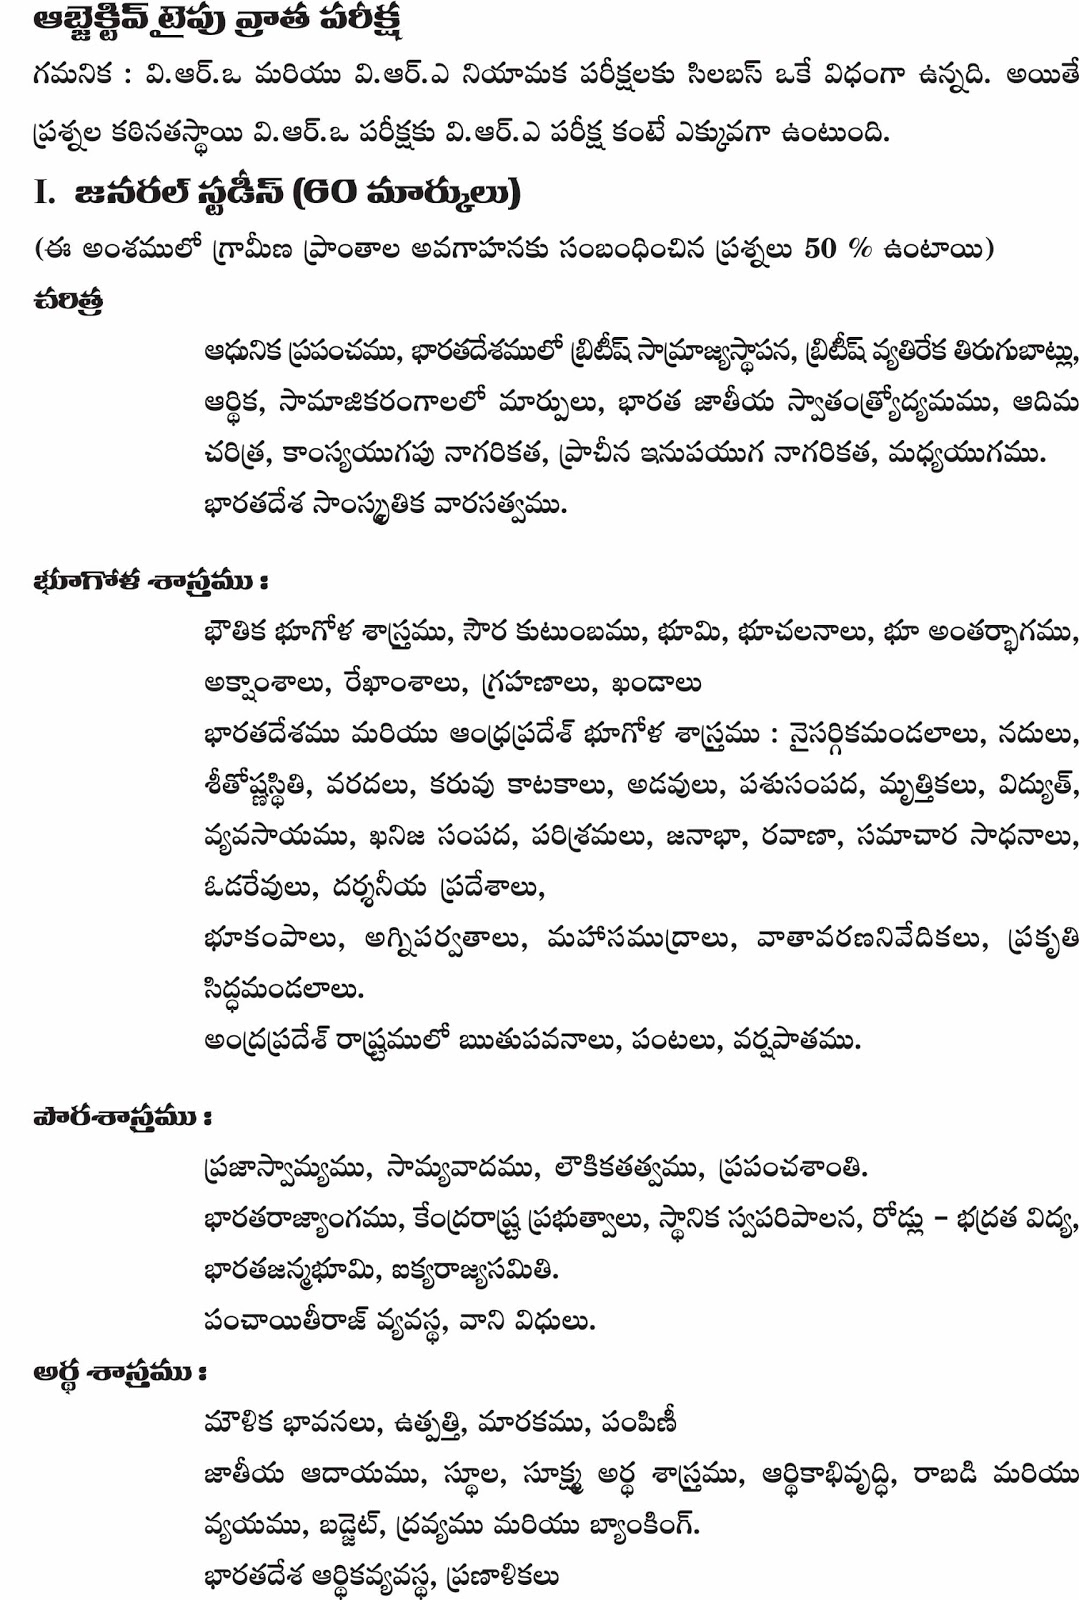 Vro Vra 2013 14 Exam Syllabus In Telugu Pdf